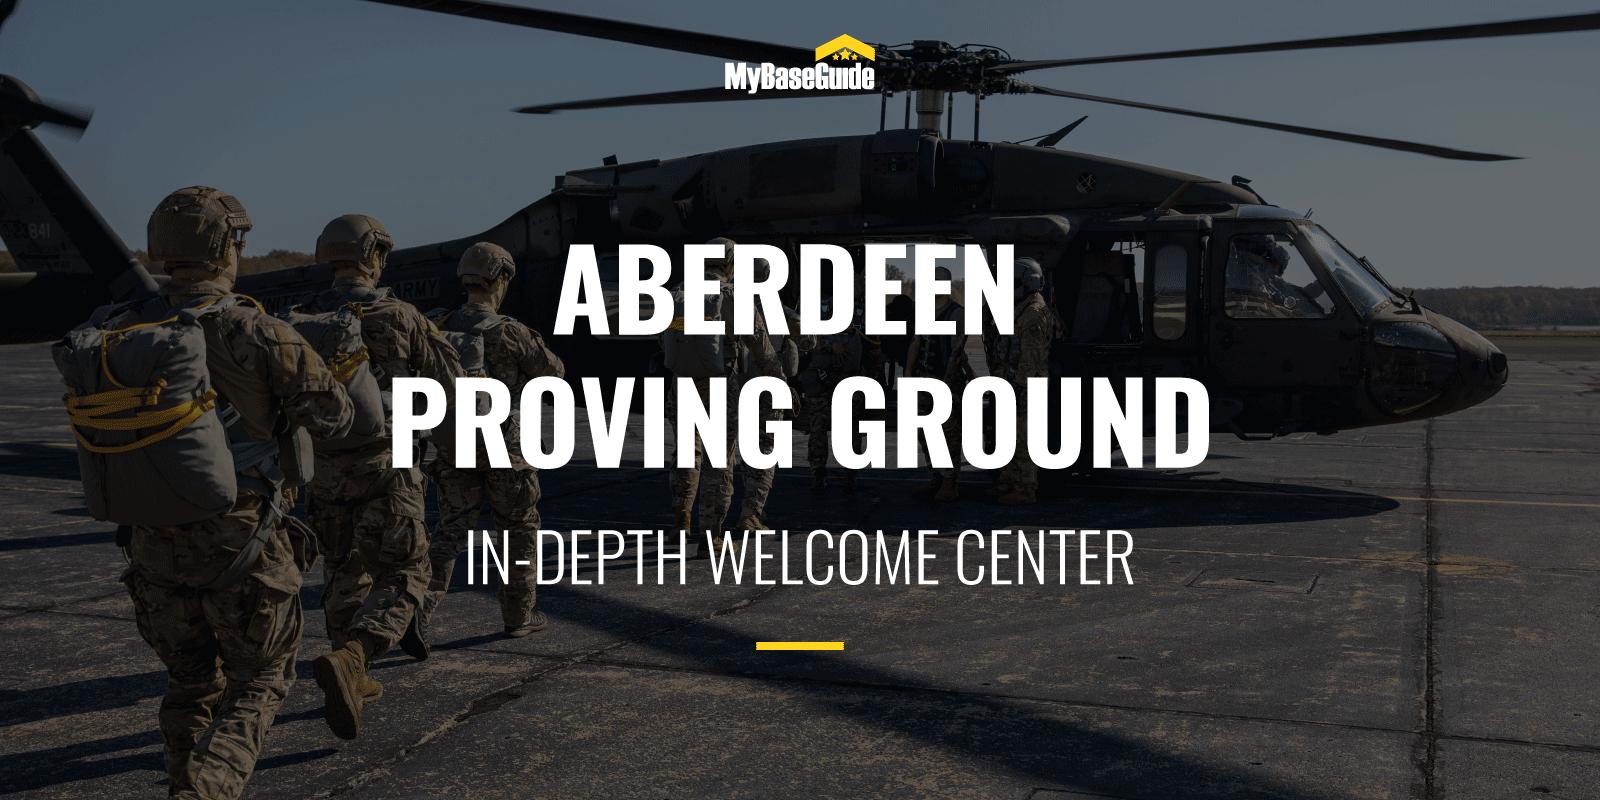 Aberdeen Proving Ground: In-Depth Welcome Center